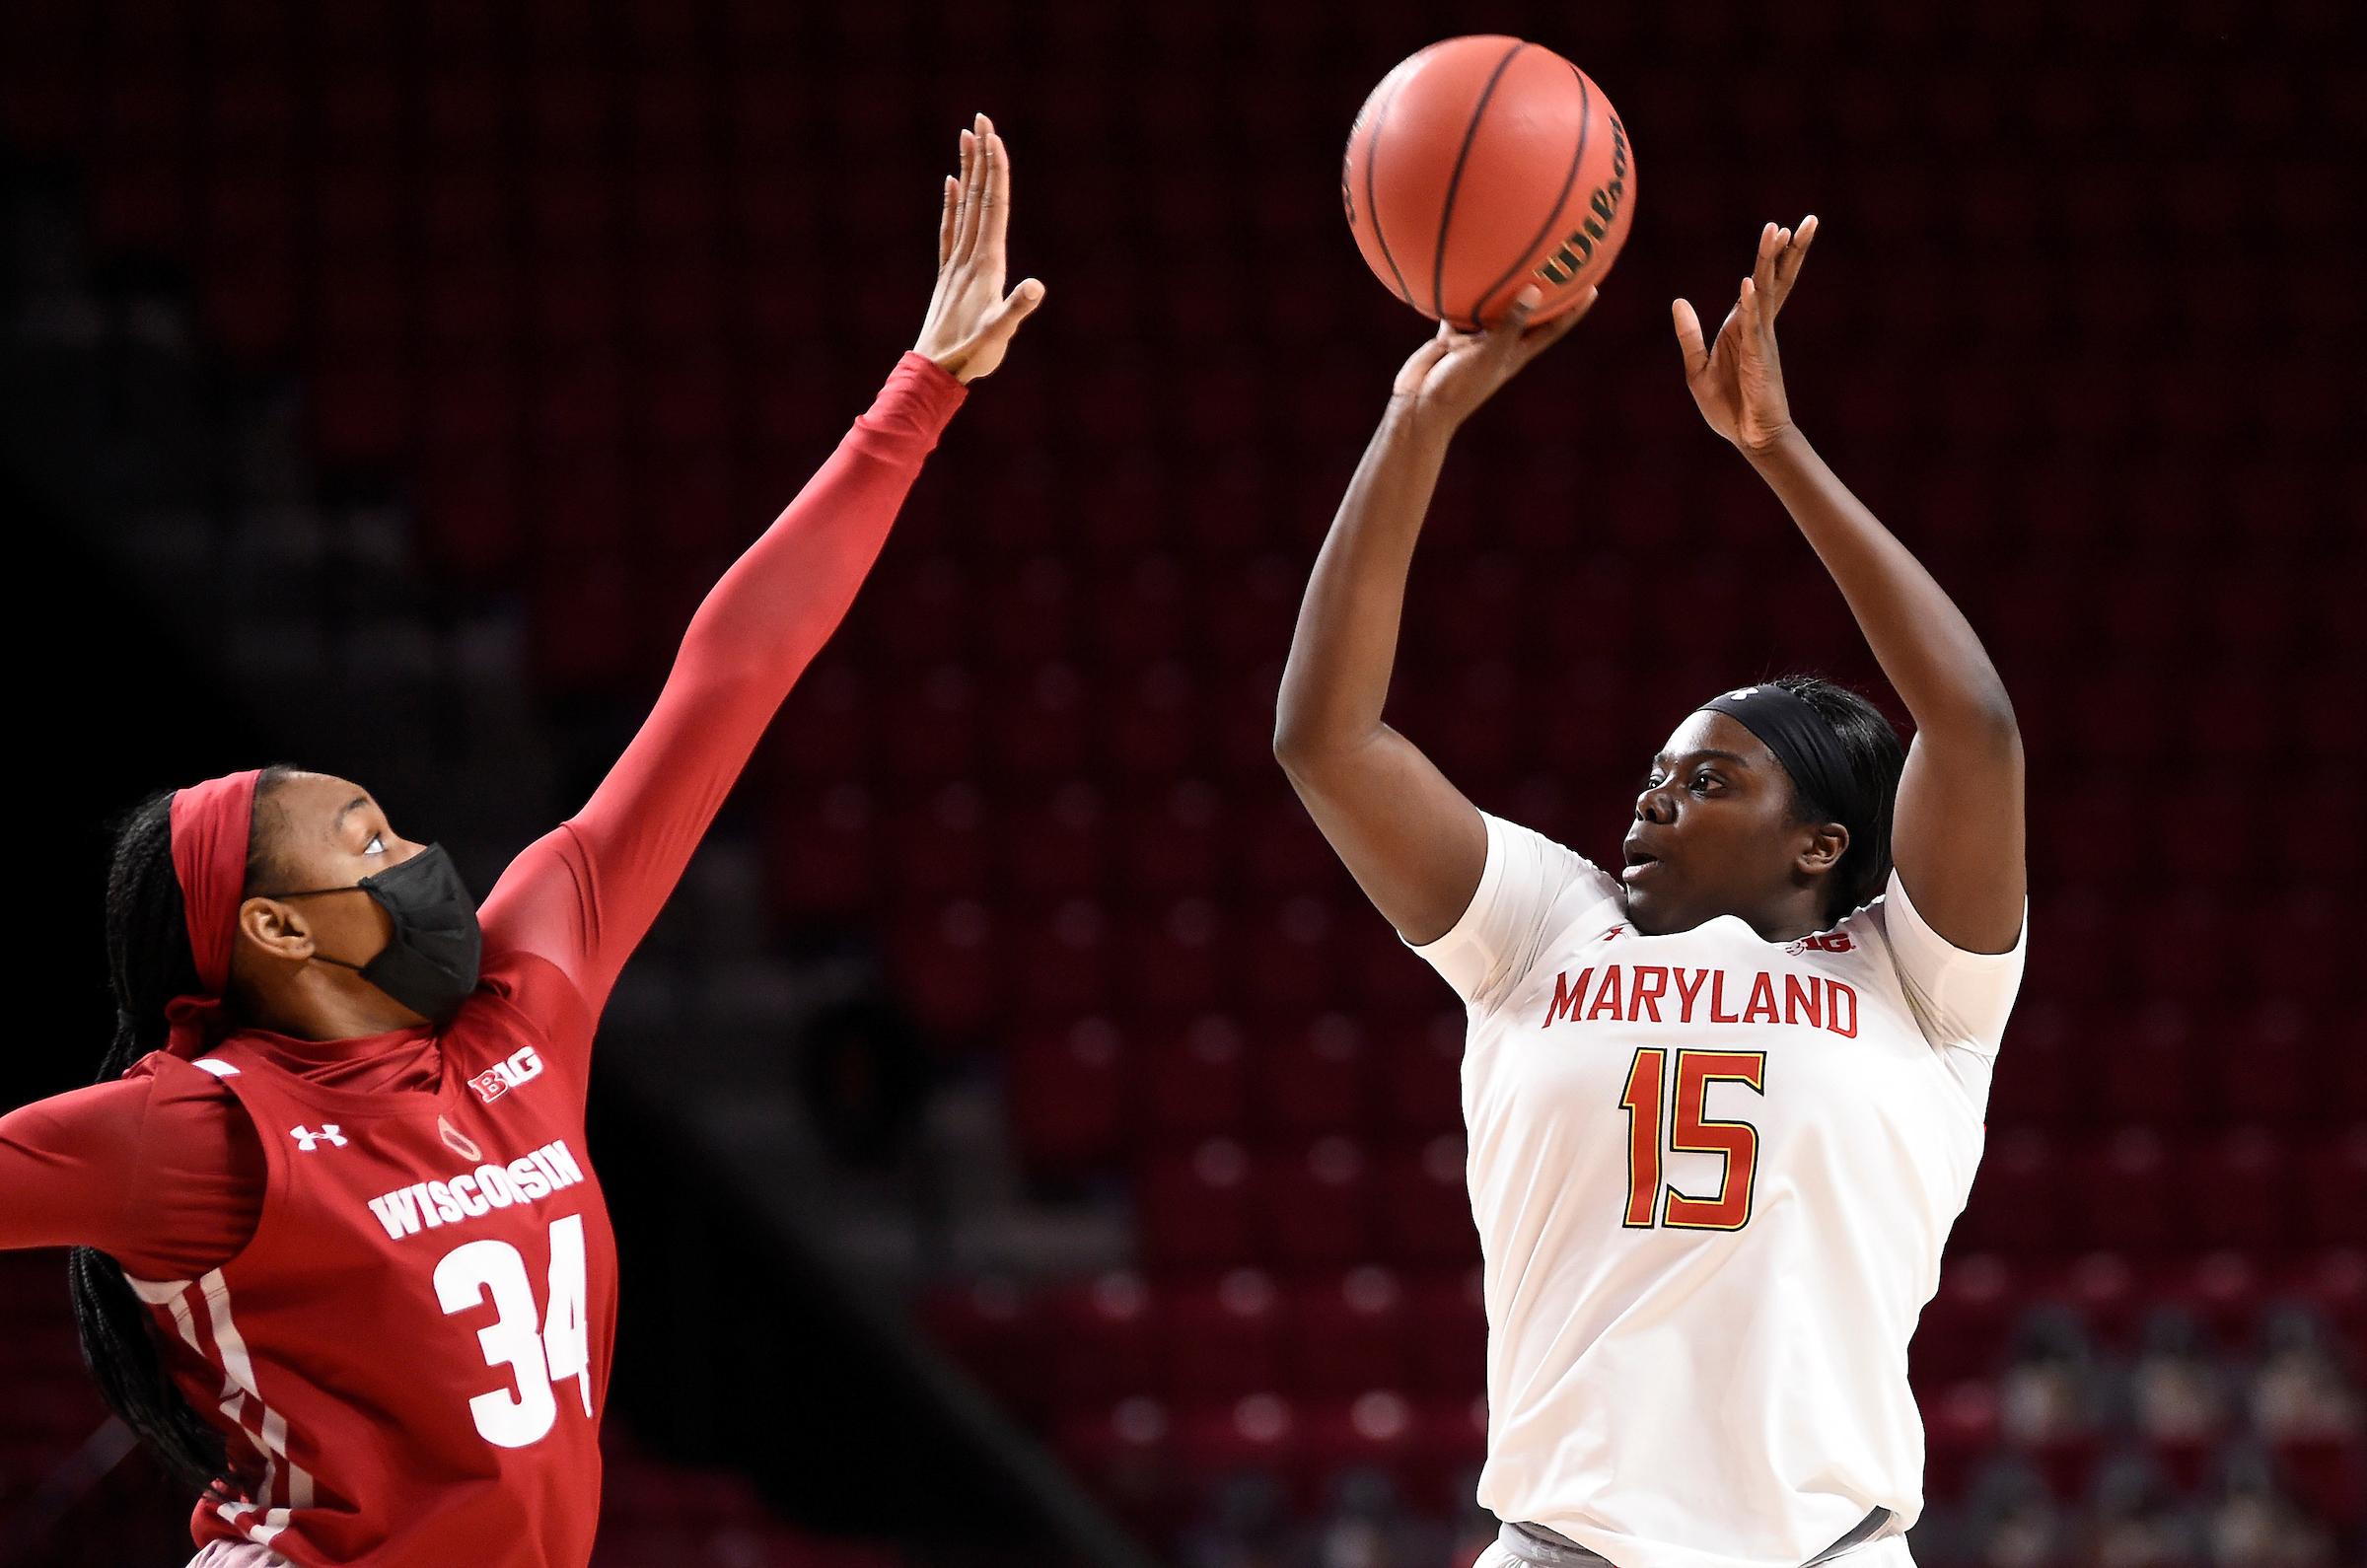 Maryland women's basketball team guard Ashley Owusu shoots over Wisconsin's Imani Lewis